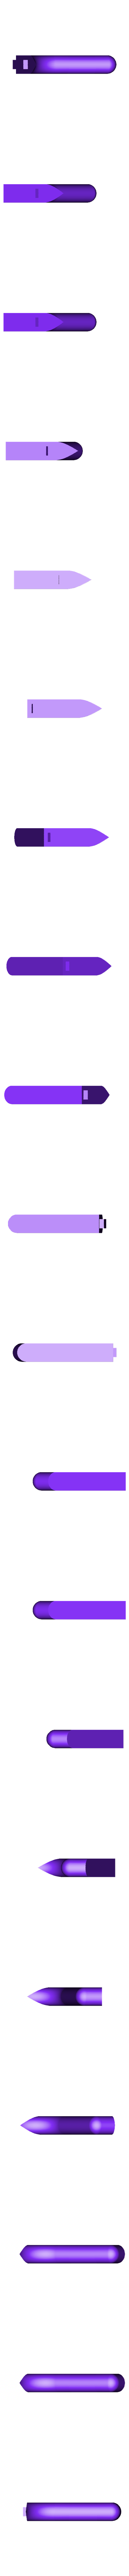 AnkerQiPassiveAmpStandLeg.stl Download free STL file Anker Qi passive amp phone stand • 3D print model, jps4you